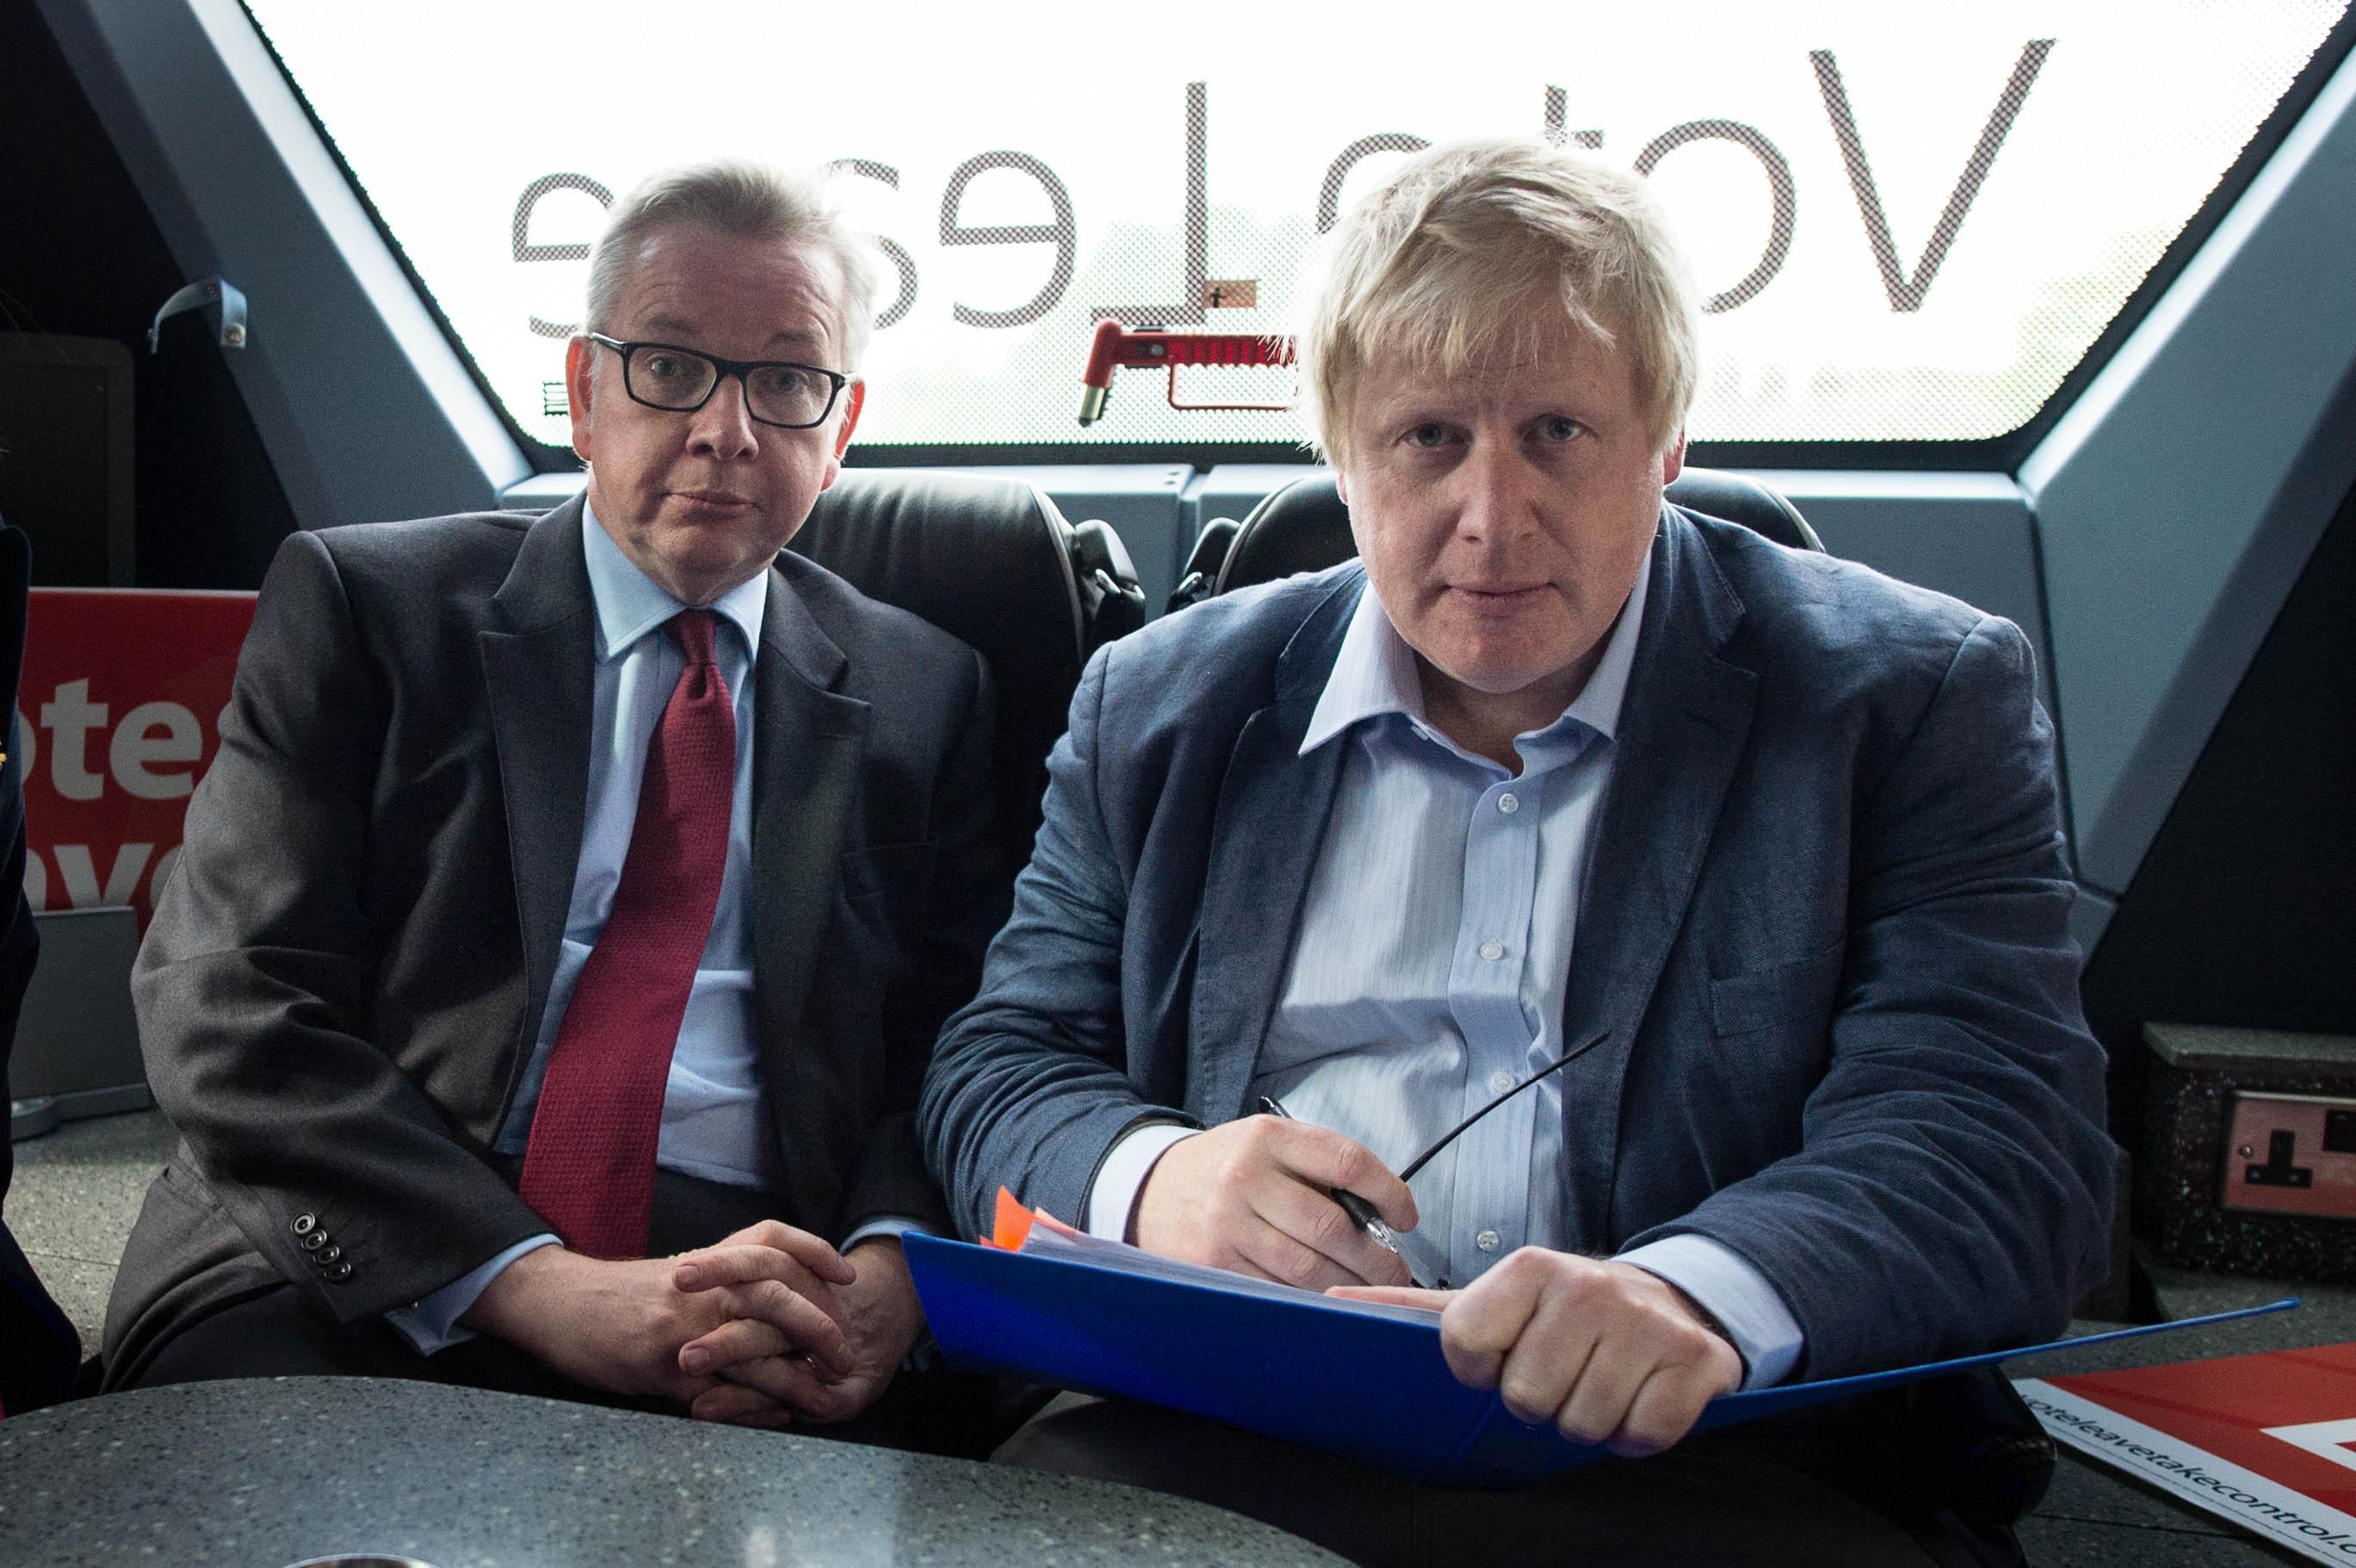 Michael Gove and Boris Johnson (right) (Stefan Rousseau/PA Wire)